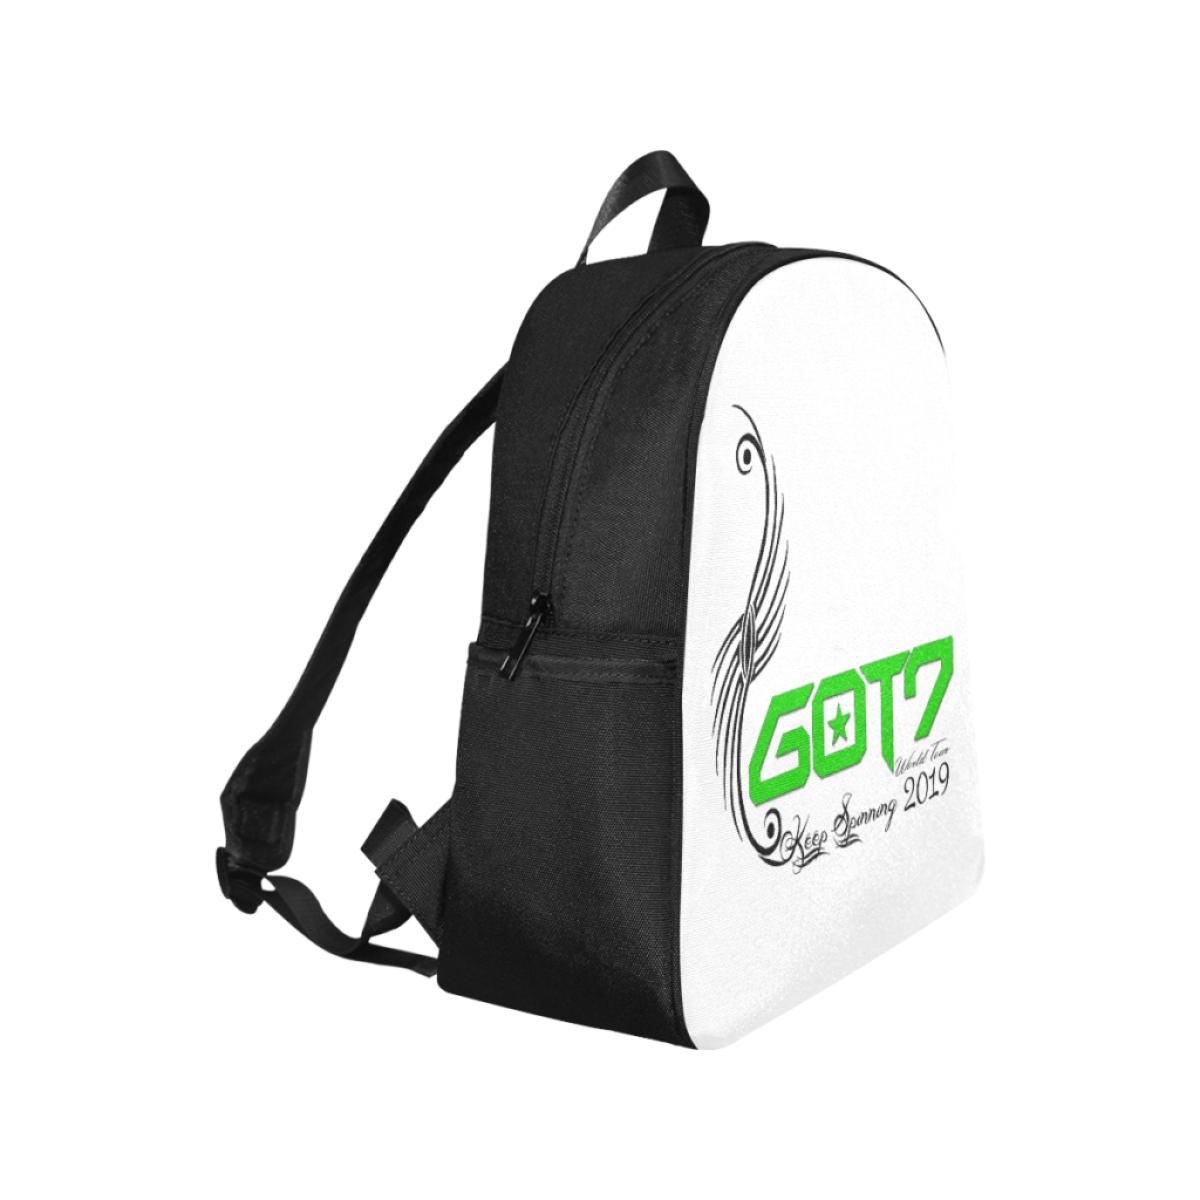 GOT7 World Tour Multi-Pocket Backpack